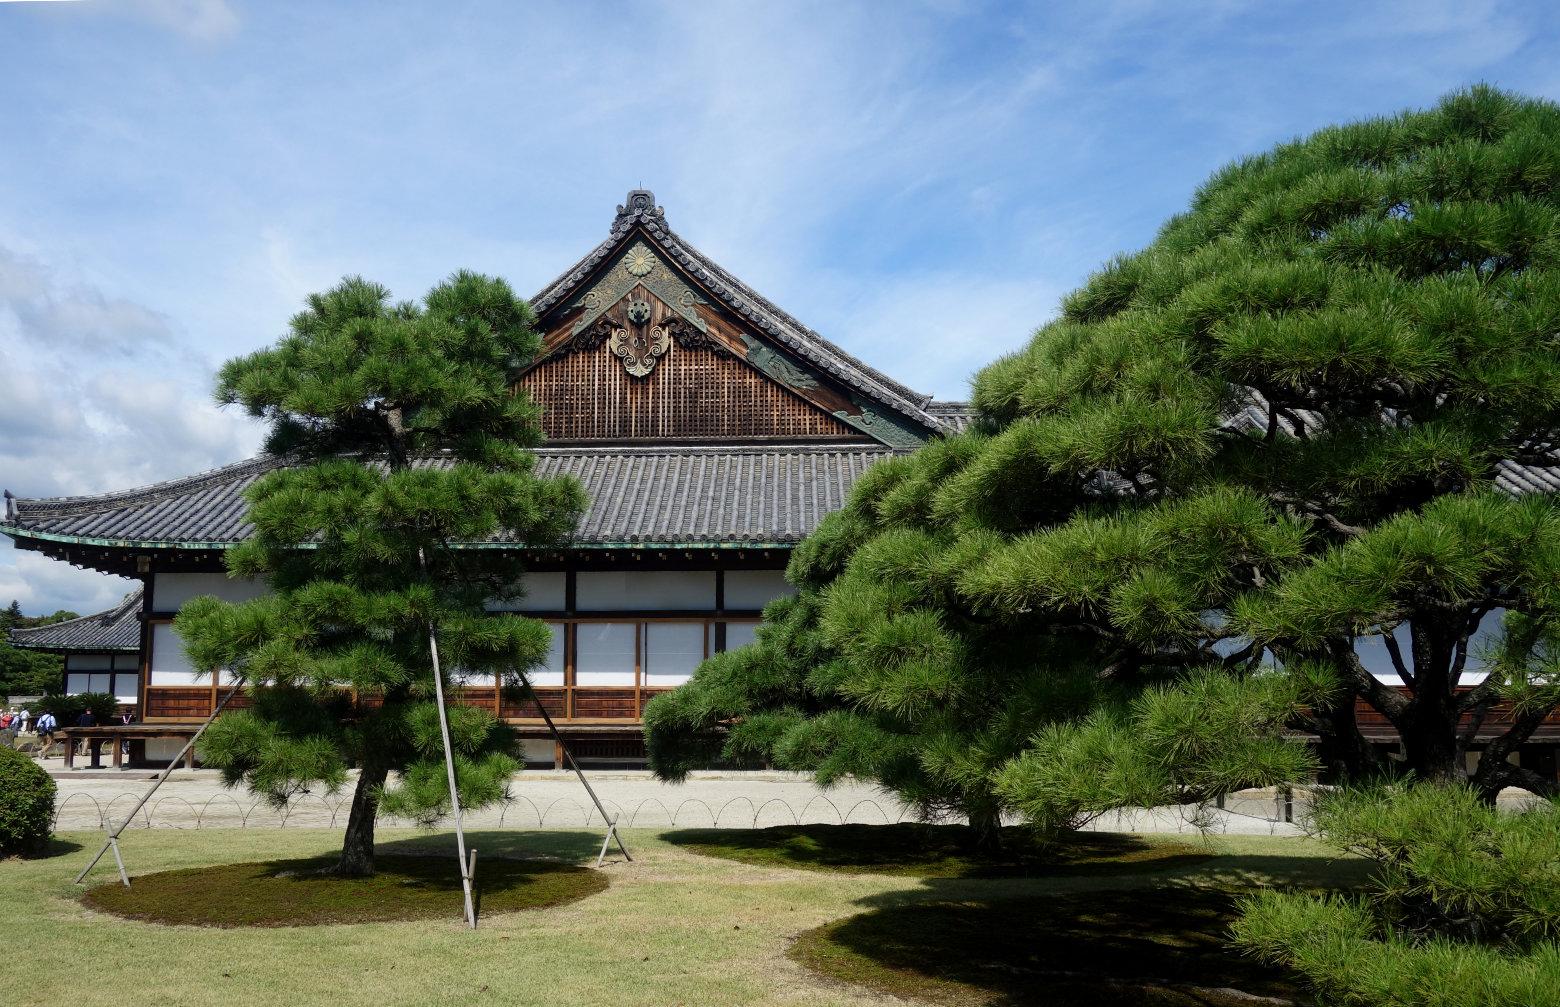 Kyoto Nijo-jo Castle